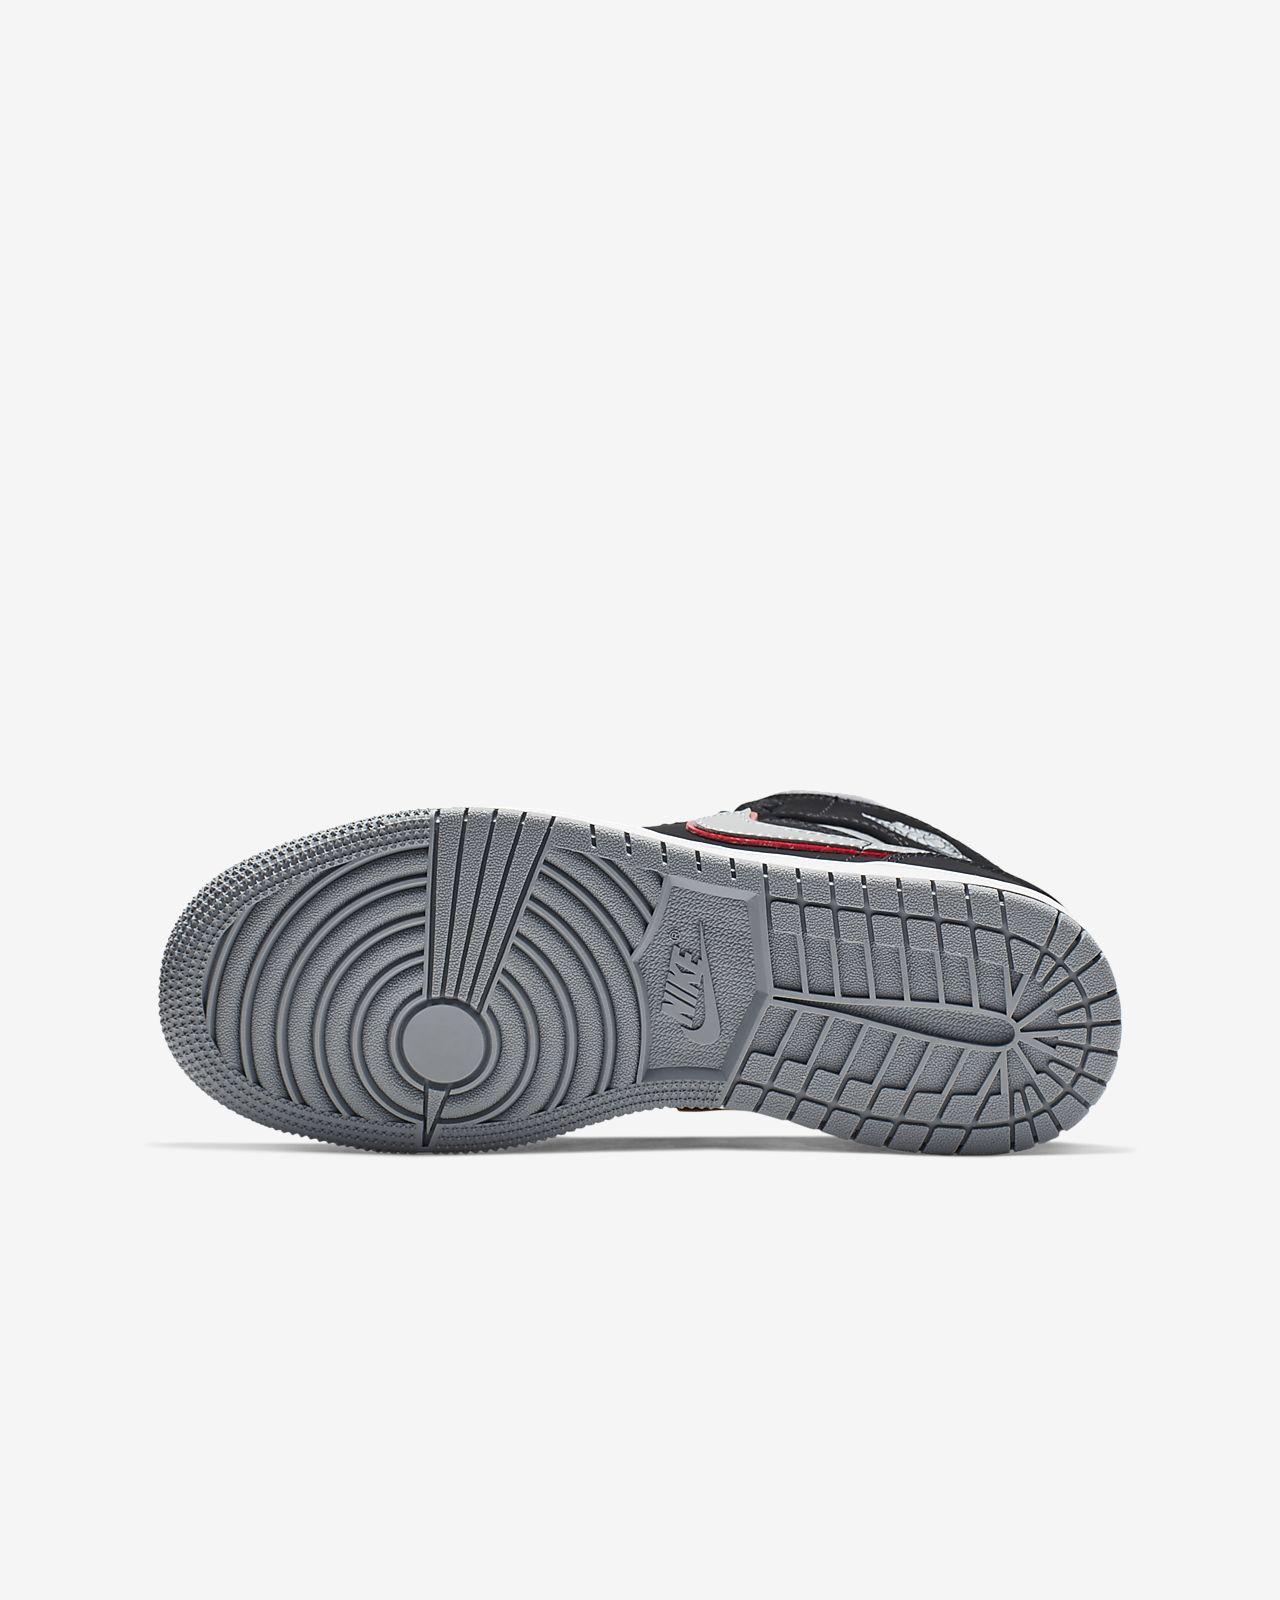 2c4bfa6374d9 Air Jordan 1 Mid Big Kids  Shoe. Nike.com